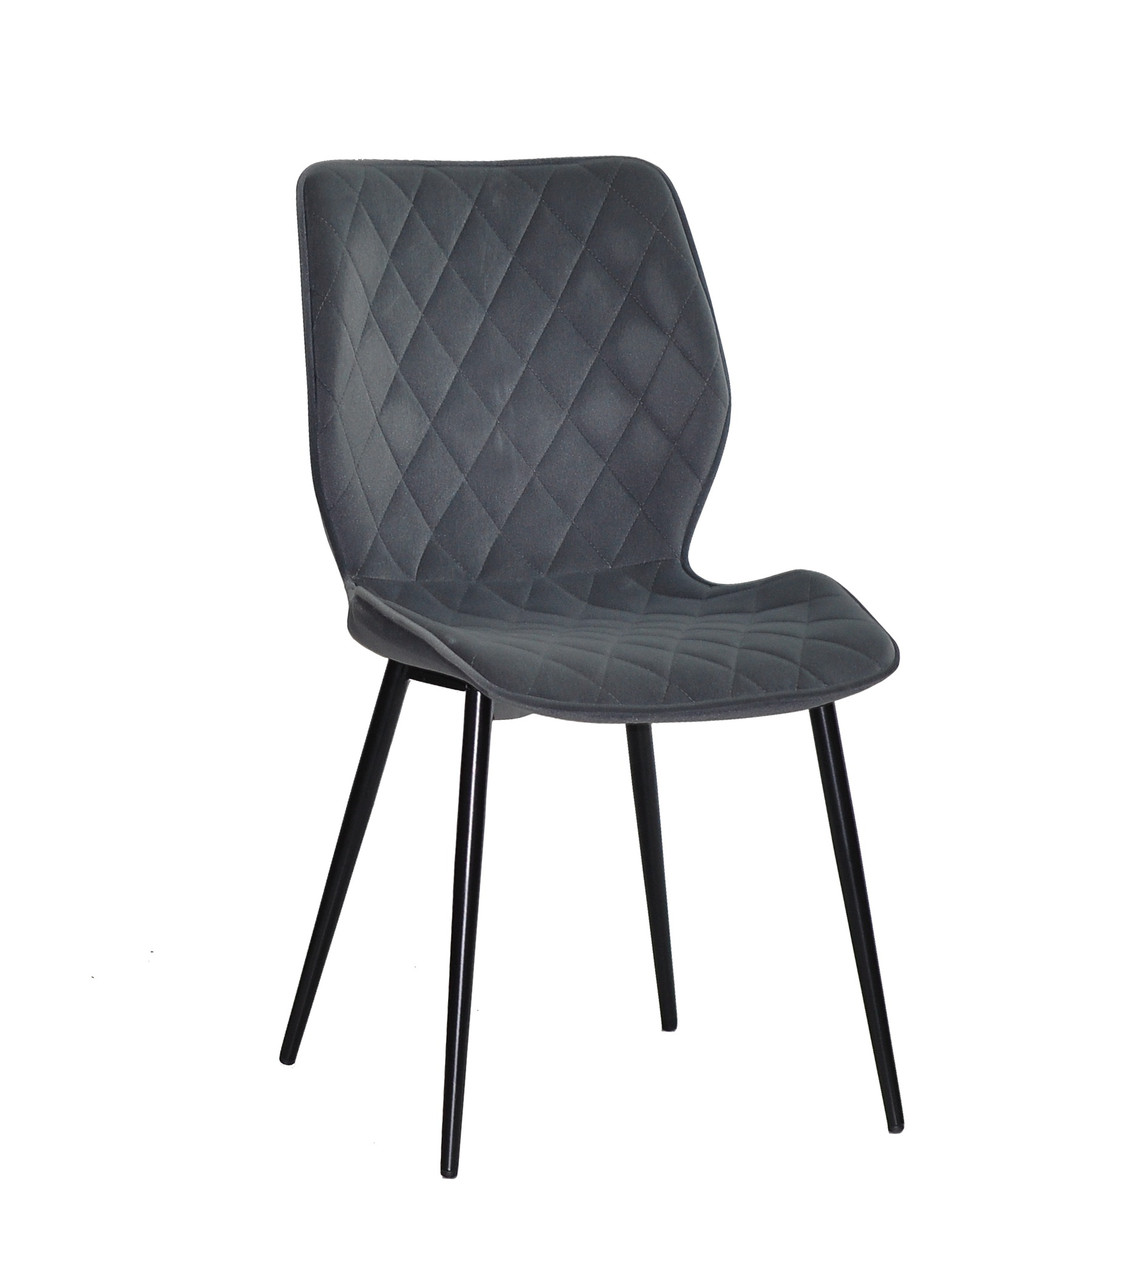 Обеденный стул Nolan ML (Нолан) серый бархат на черных ногах металл